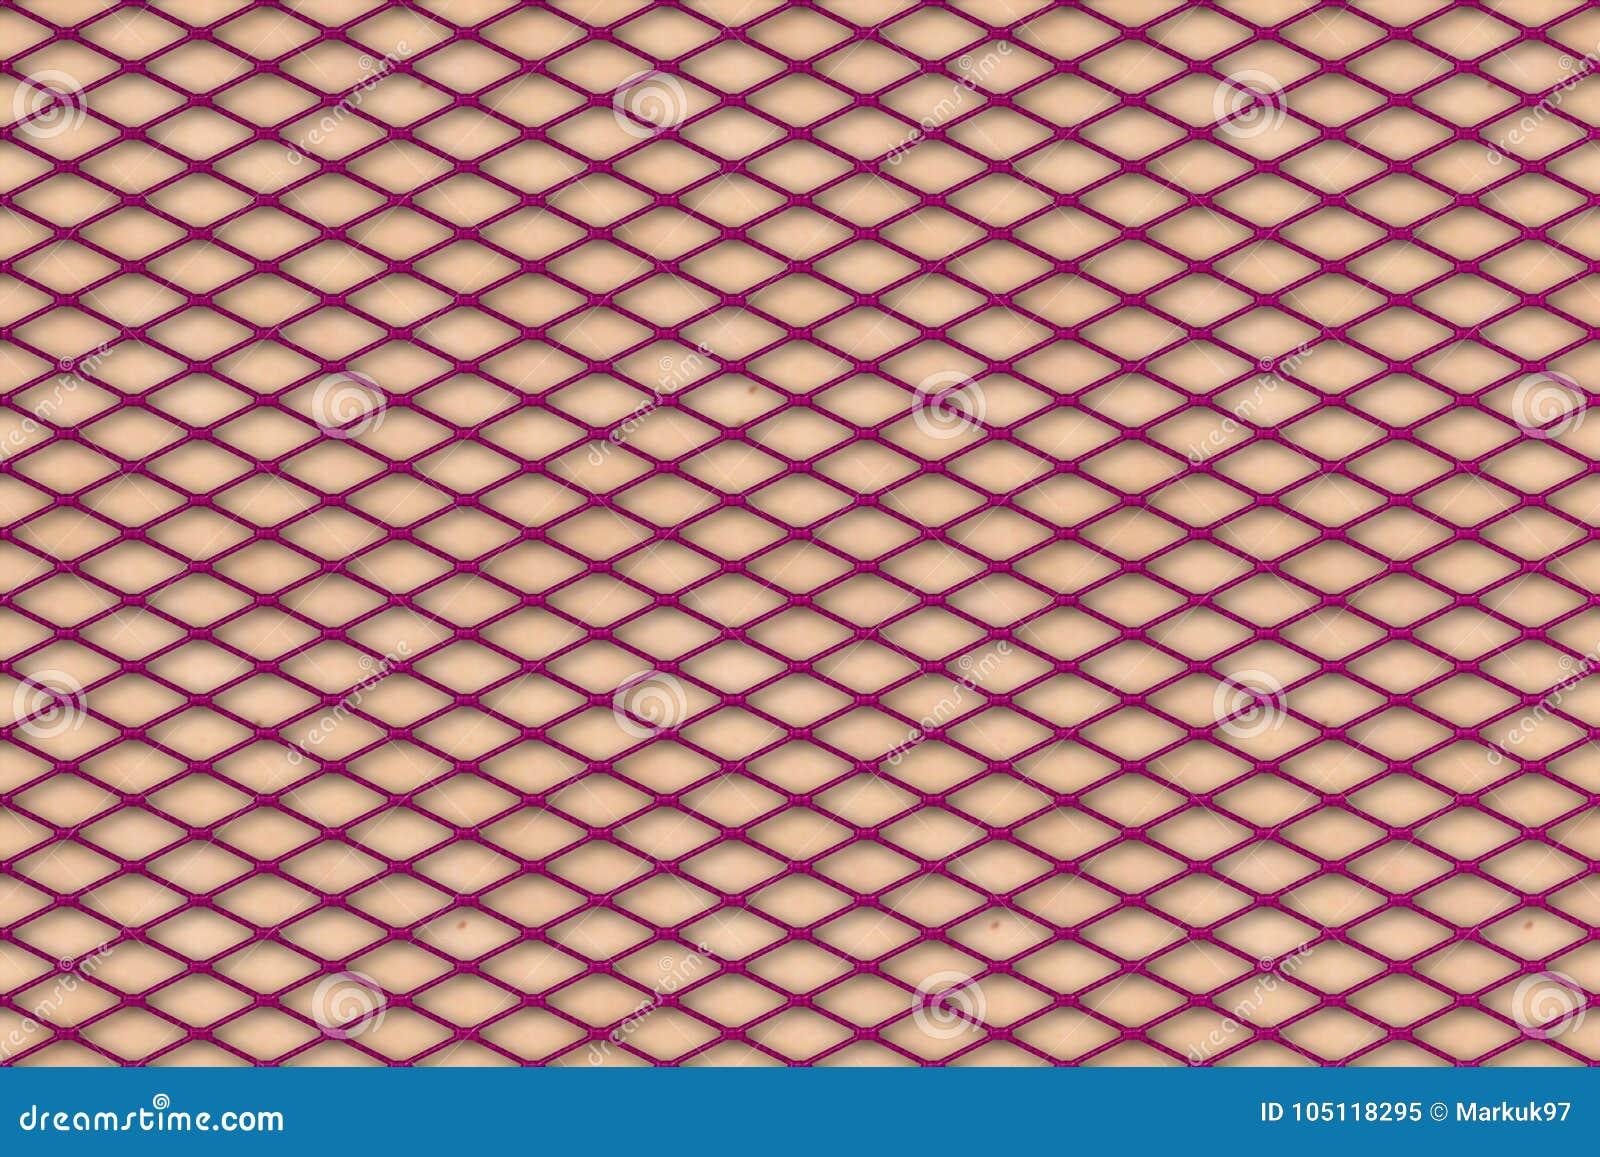 df8ade3aa77 Purple Fishnet Texture On Pale Skin Stock Illustration ...